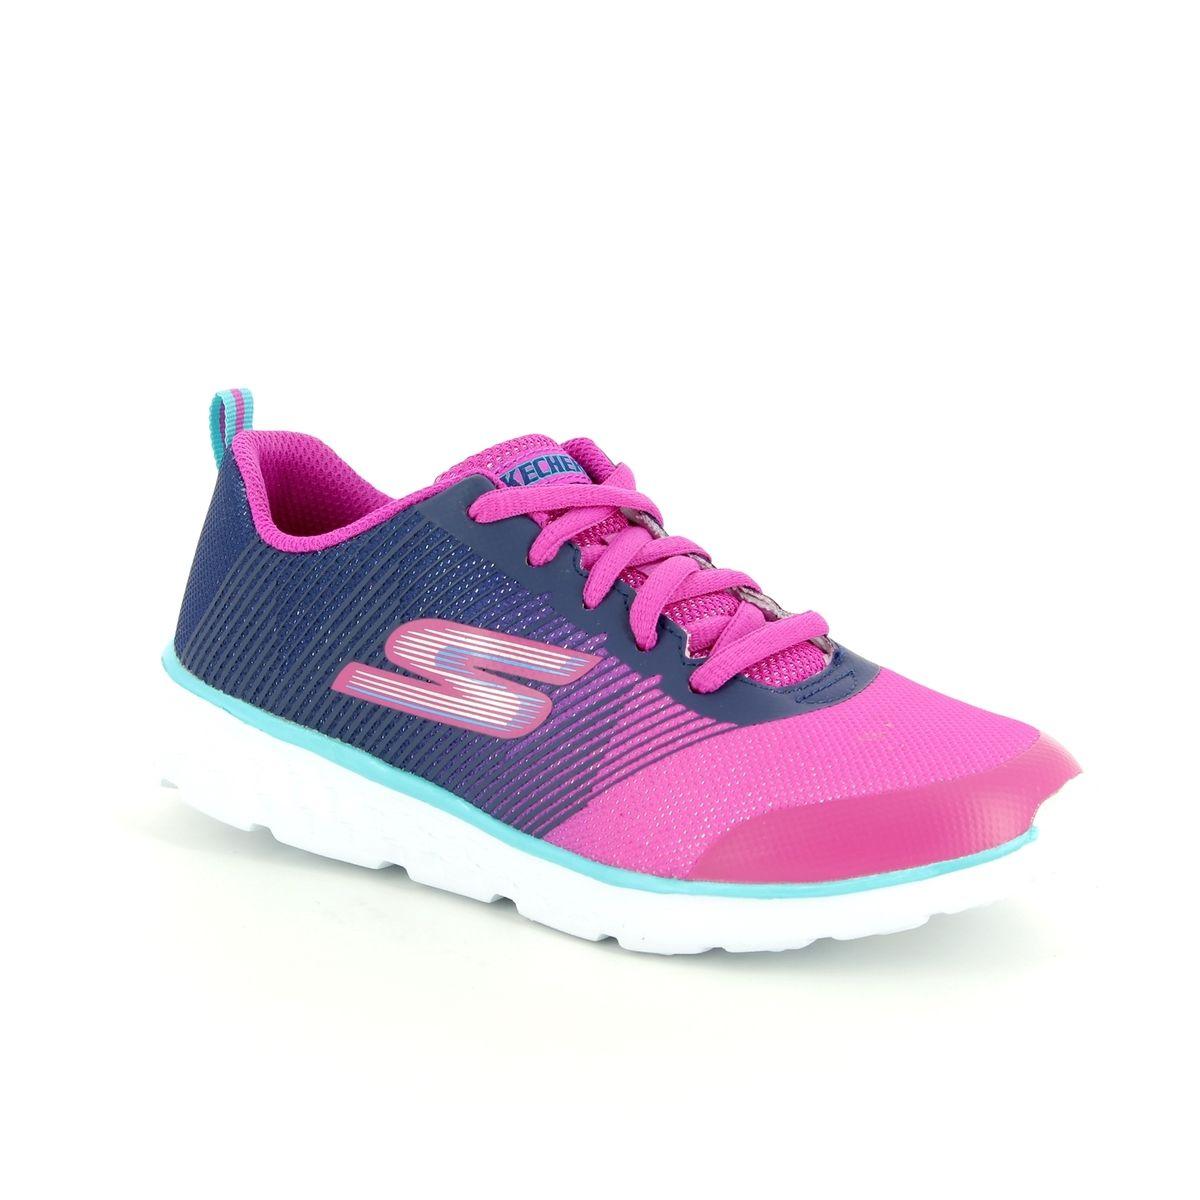 fdb0c5046a7f Skechers Go Run 400 81353 NVPK Navy-Pink trainers